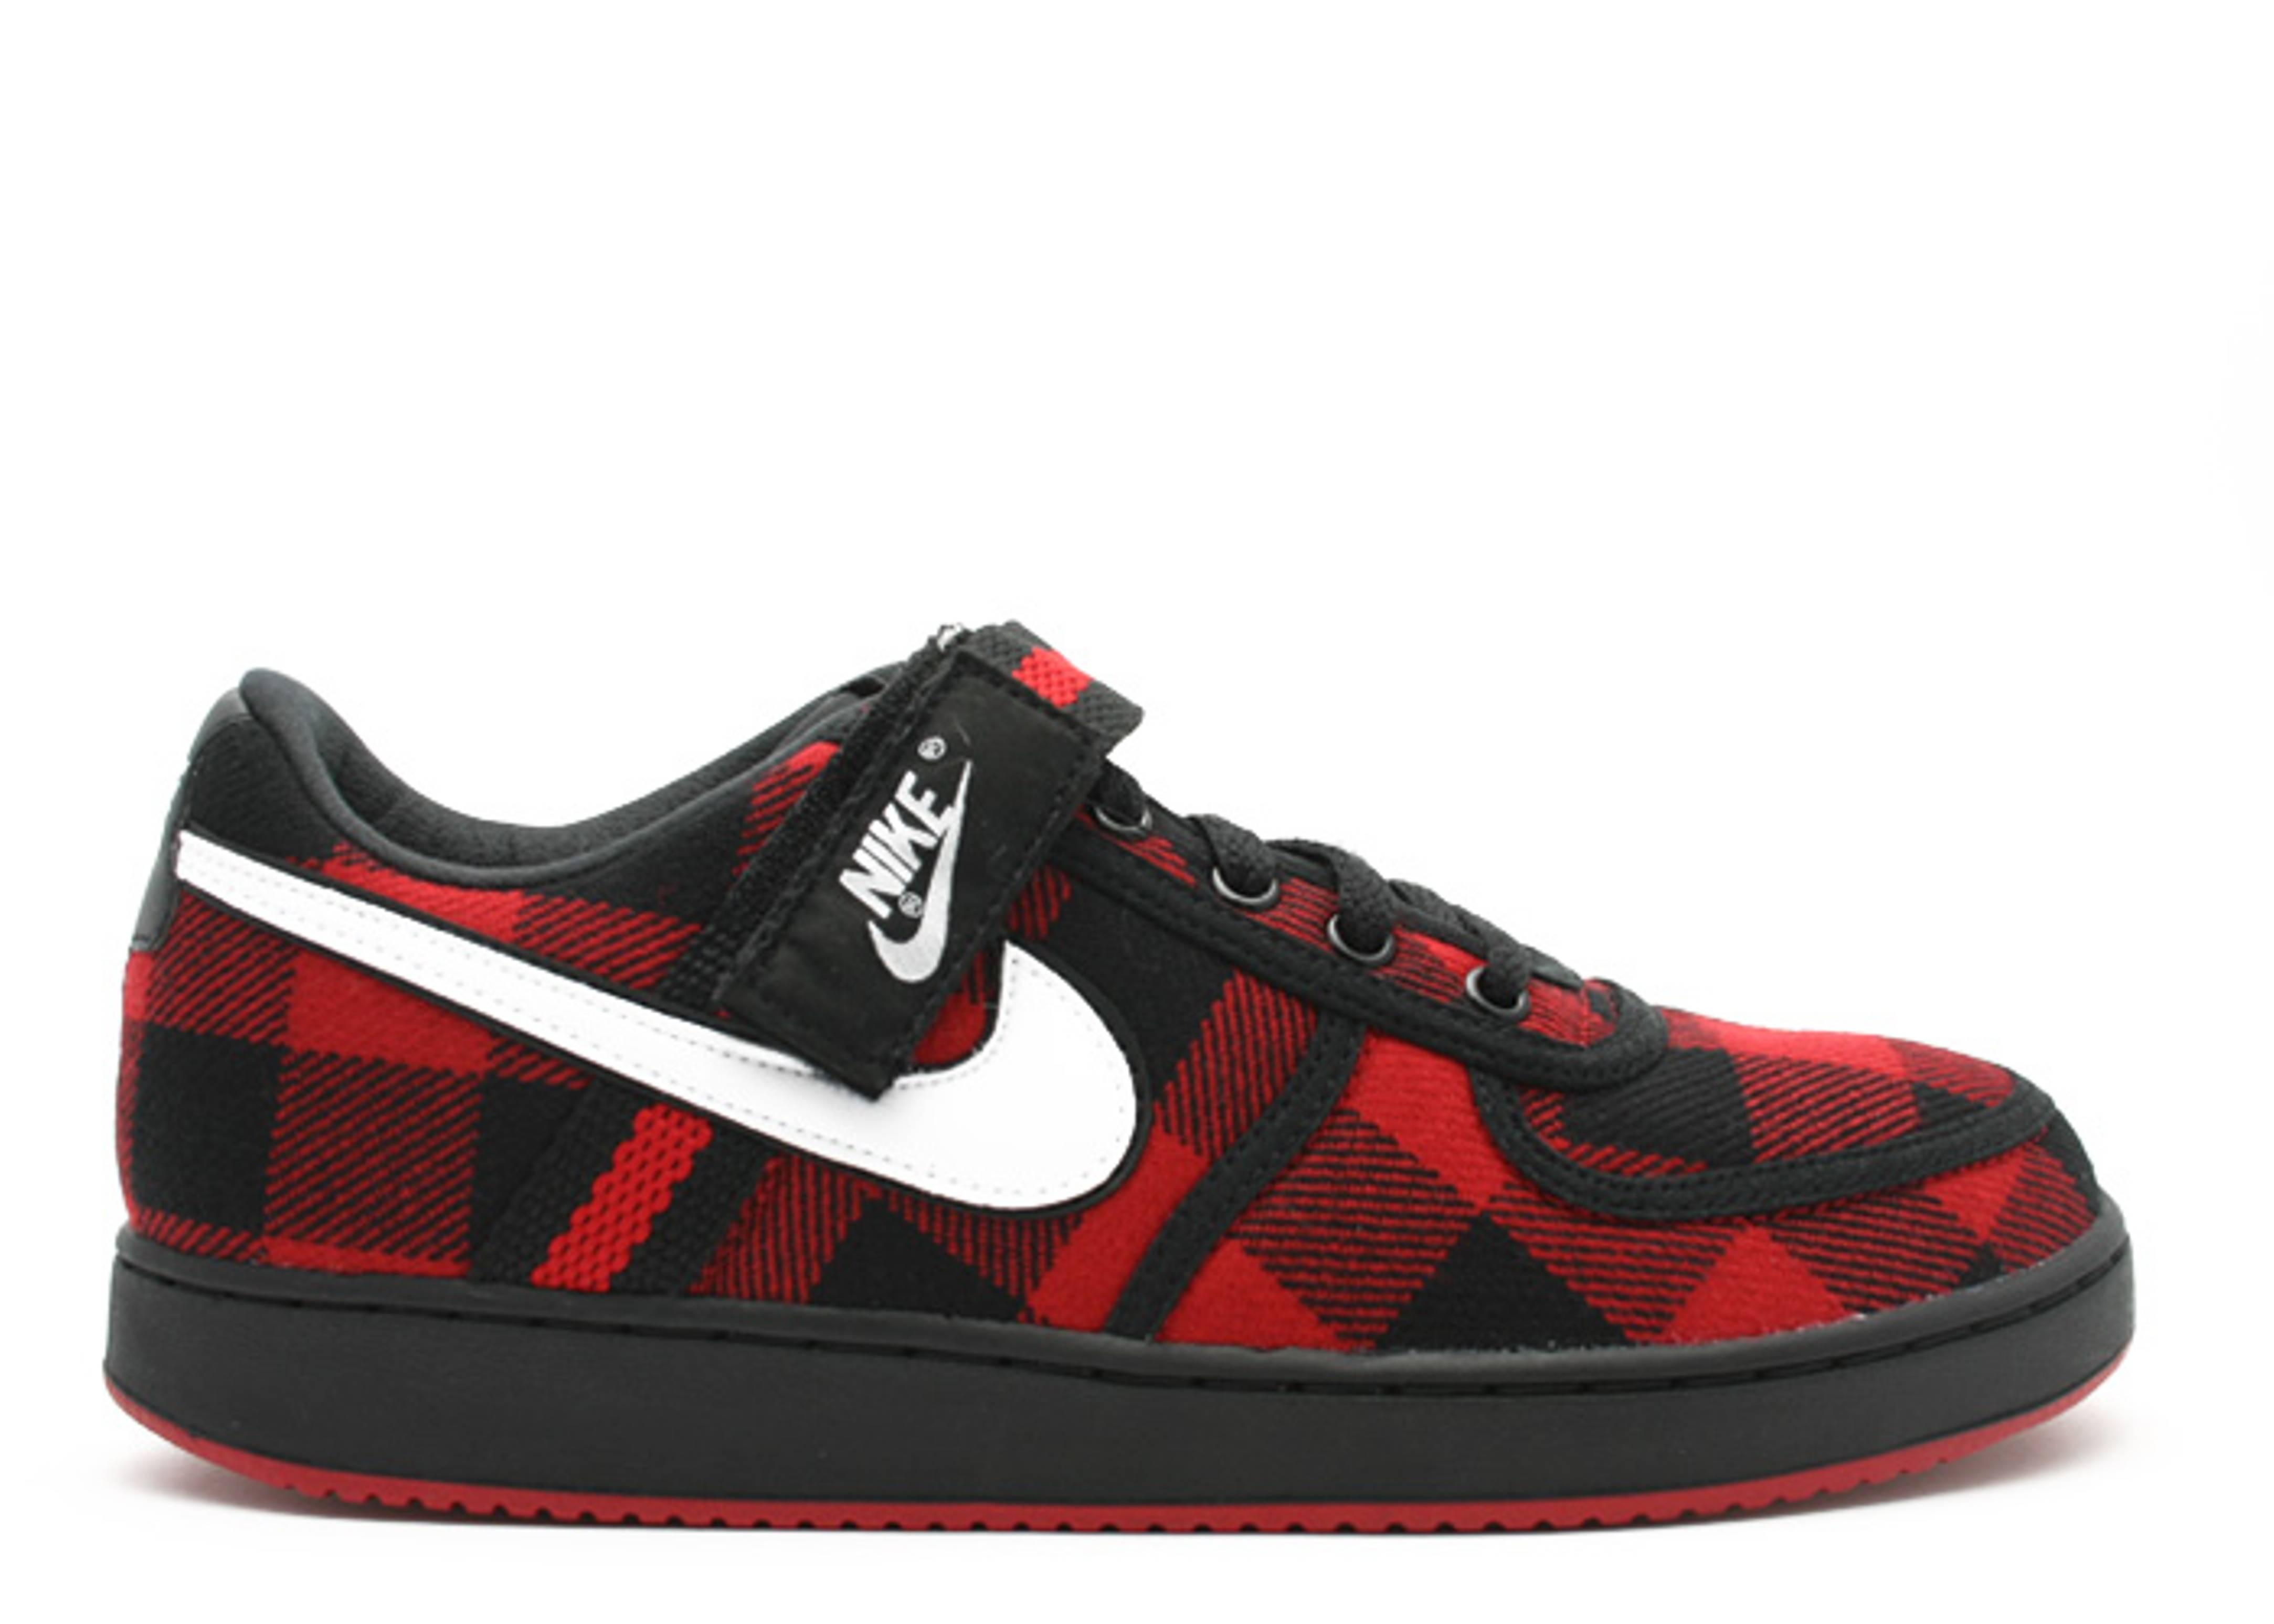 Vandal Low Premium - Nike - 341537 611 - varsity red white-black ... 632475eea